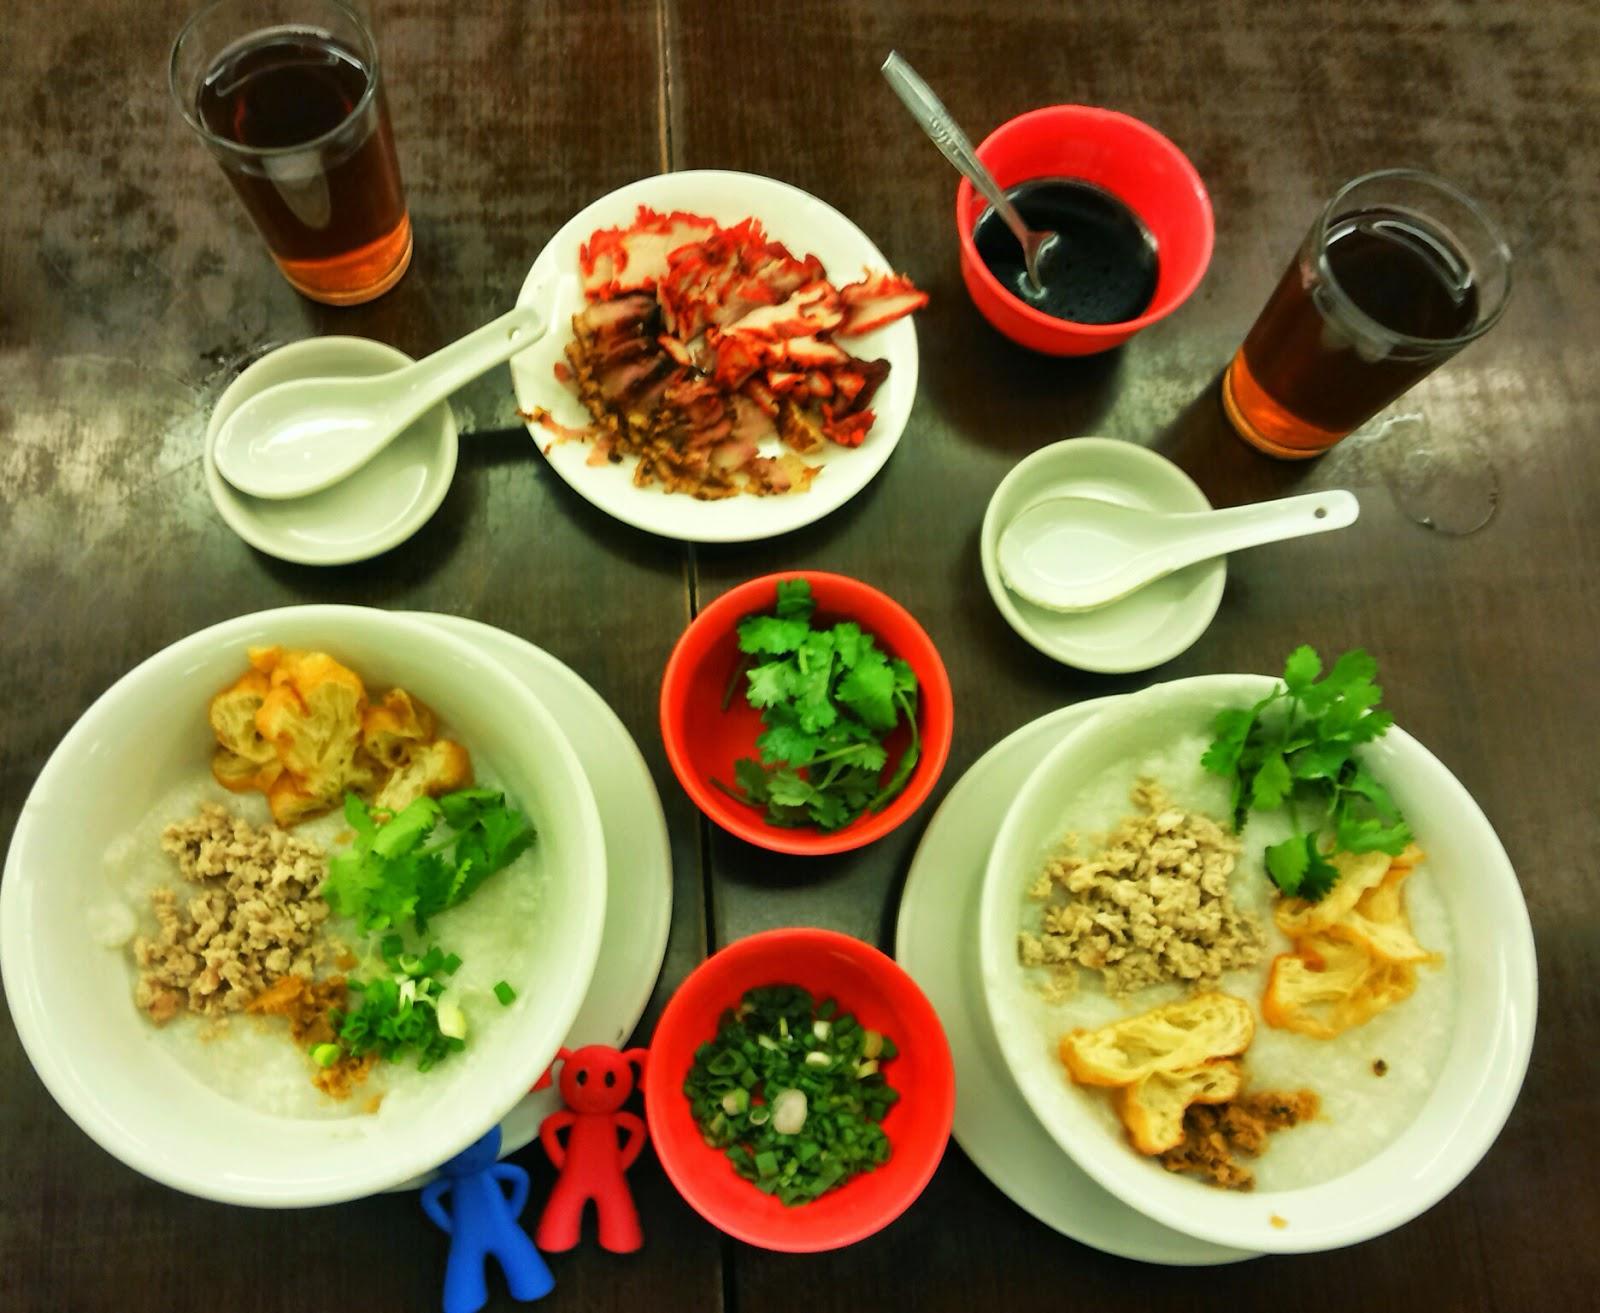 restoran chinese food Bandung, Hong Sin Restaurant, Cari Makan Aja